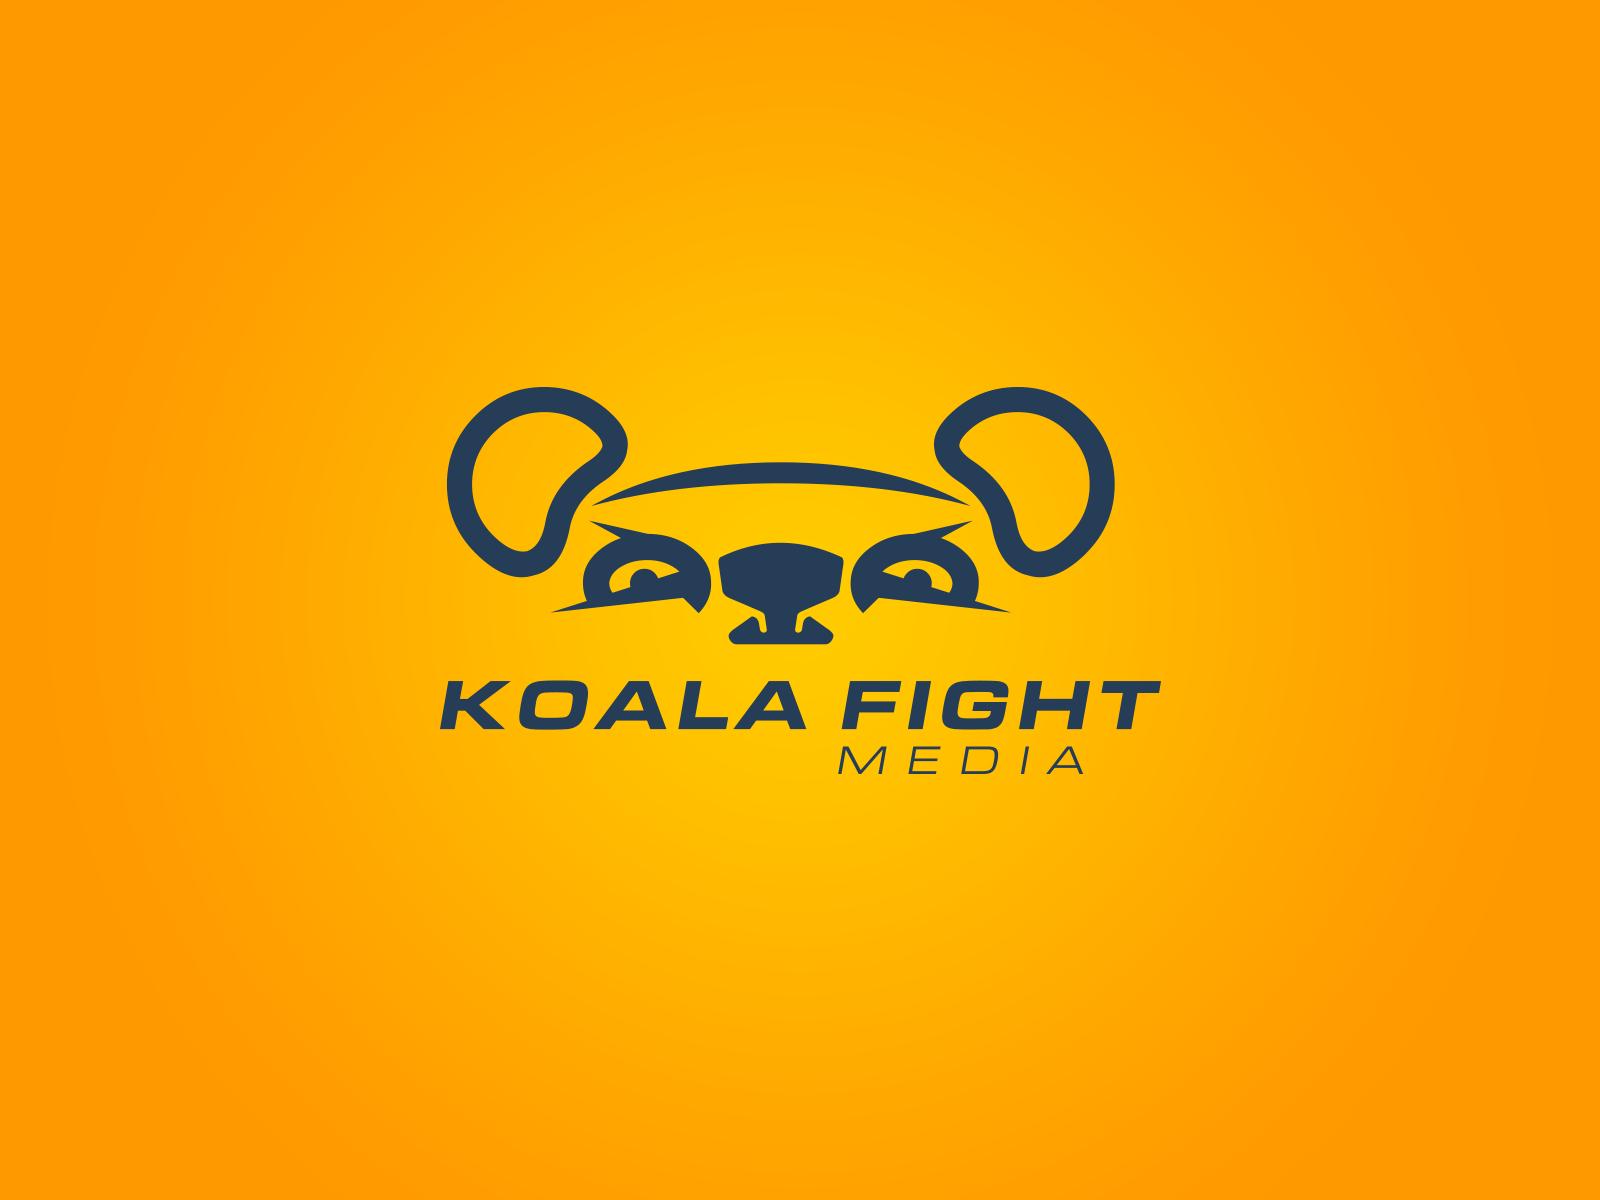 Koala Fight Media Logotype / concept